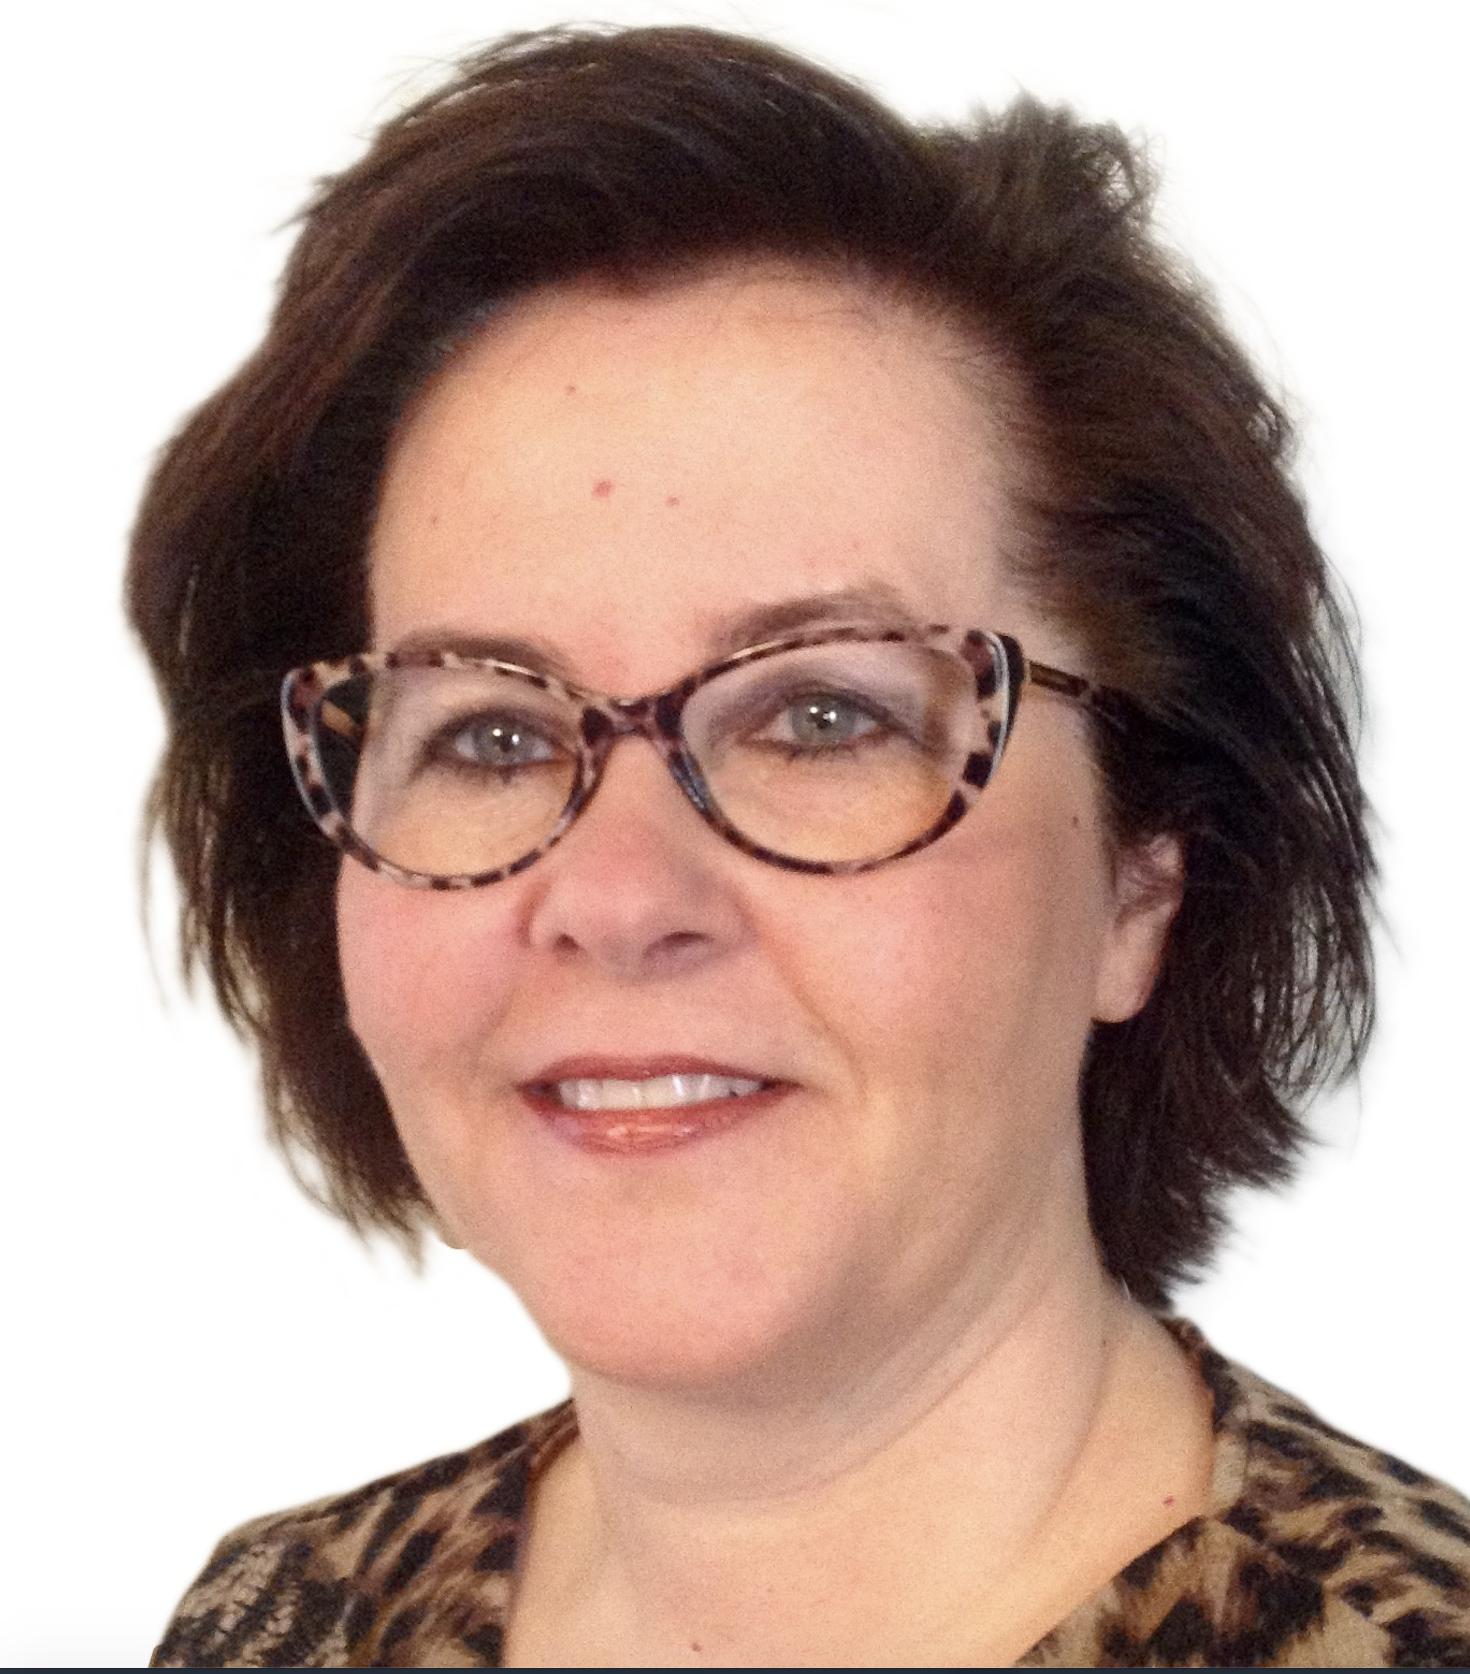 Karen McLaughlin